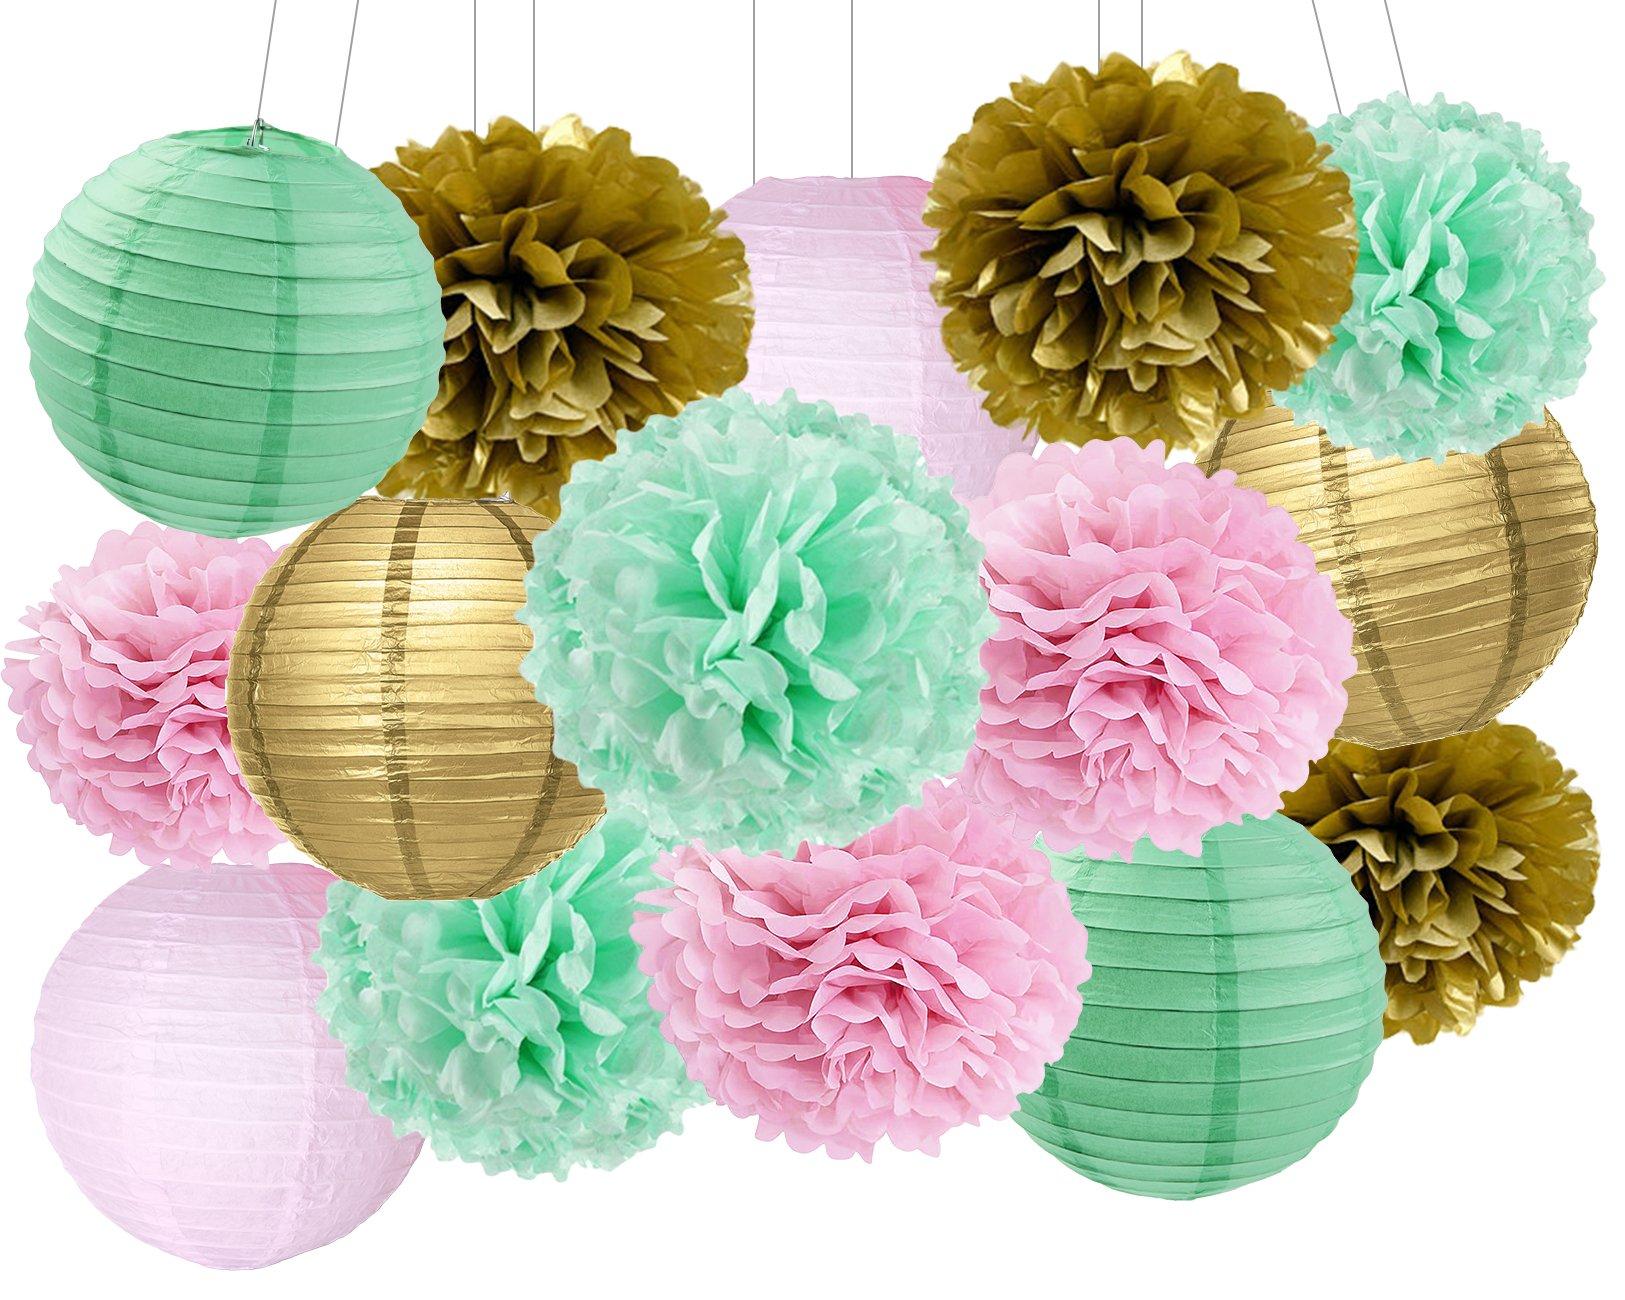 Baby Shower Decorations Furuix 15pcs Mint Pink Gold Party Decoration Tissue Paper Pom Poms for Birthday Party Decoratios Bridal Shower Decorations